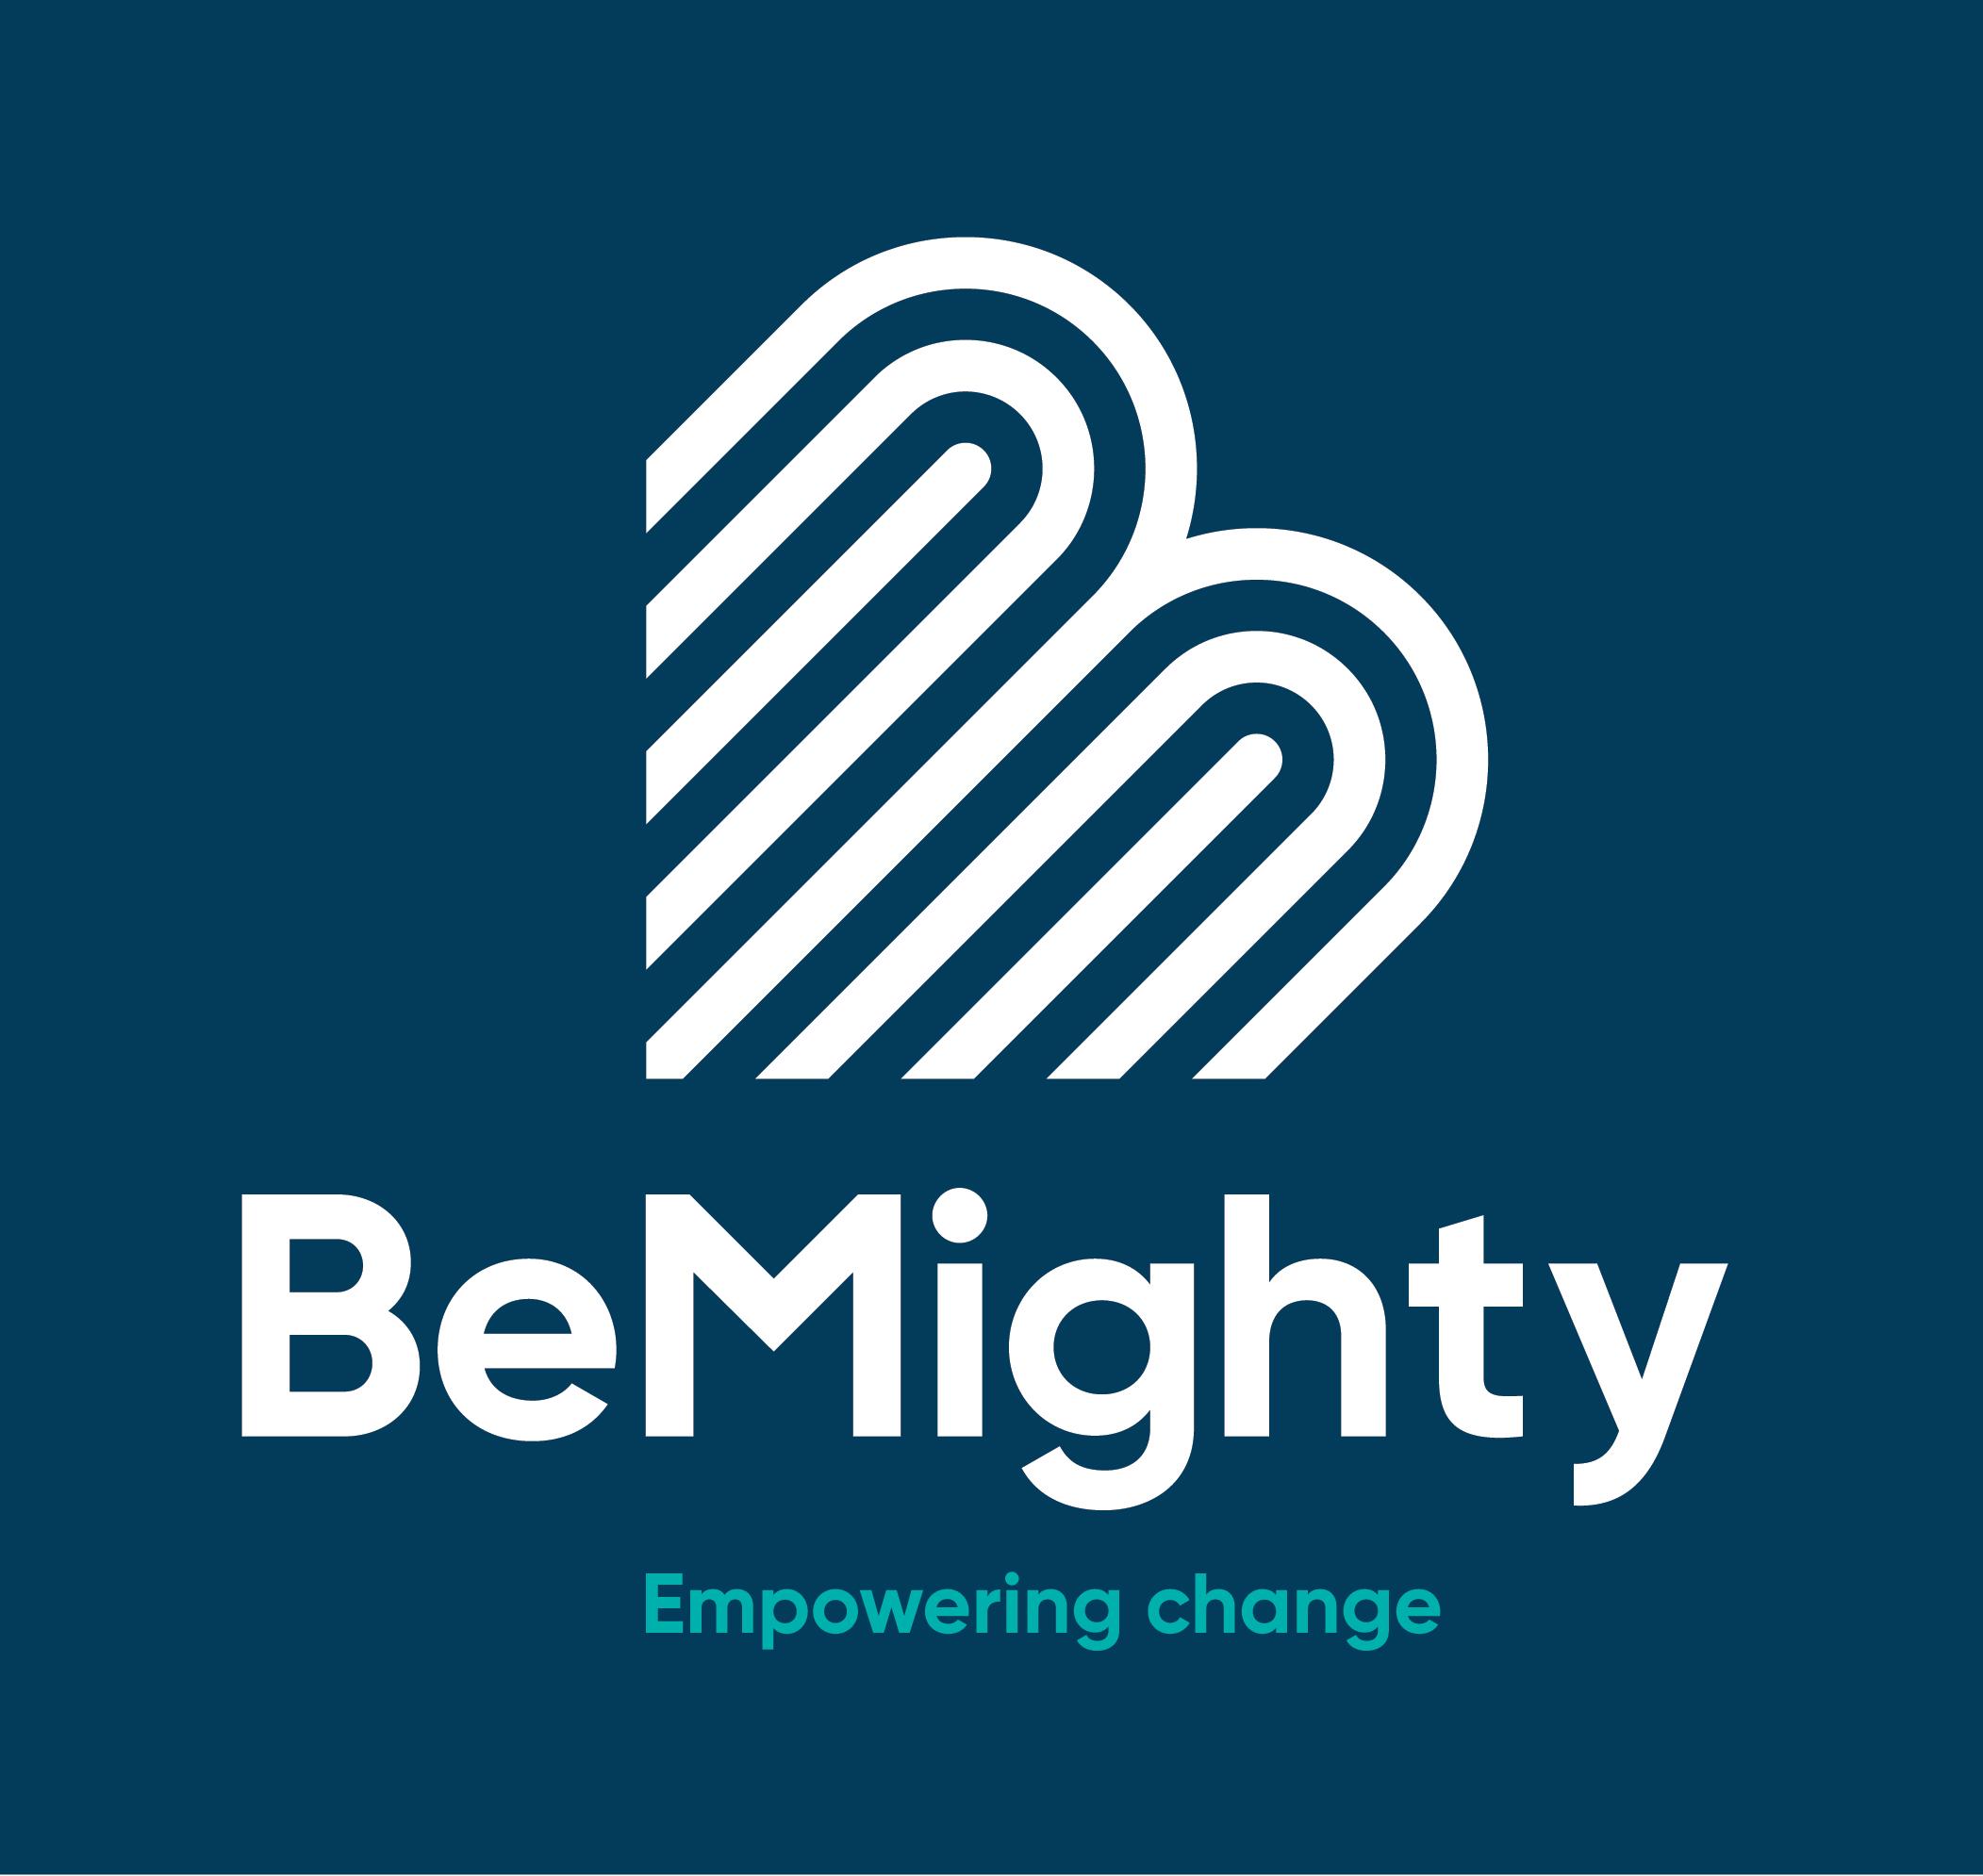 BeMighty1-01.jpg